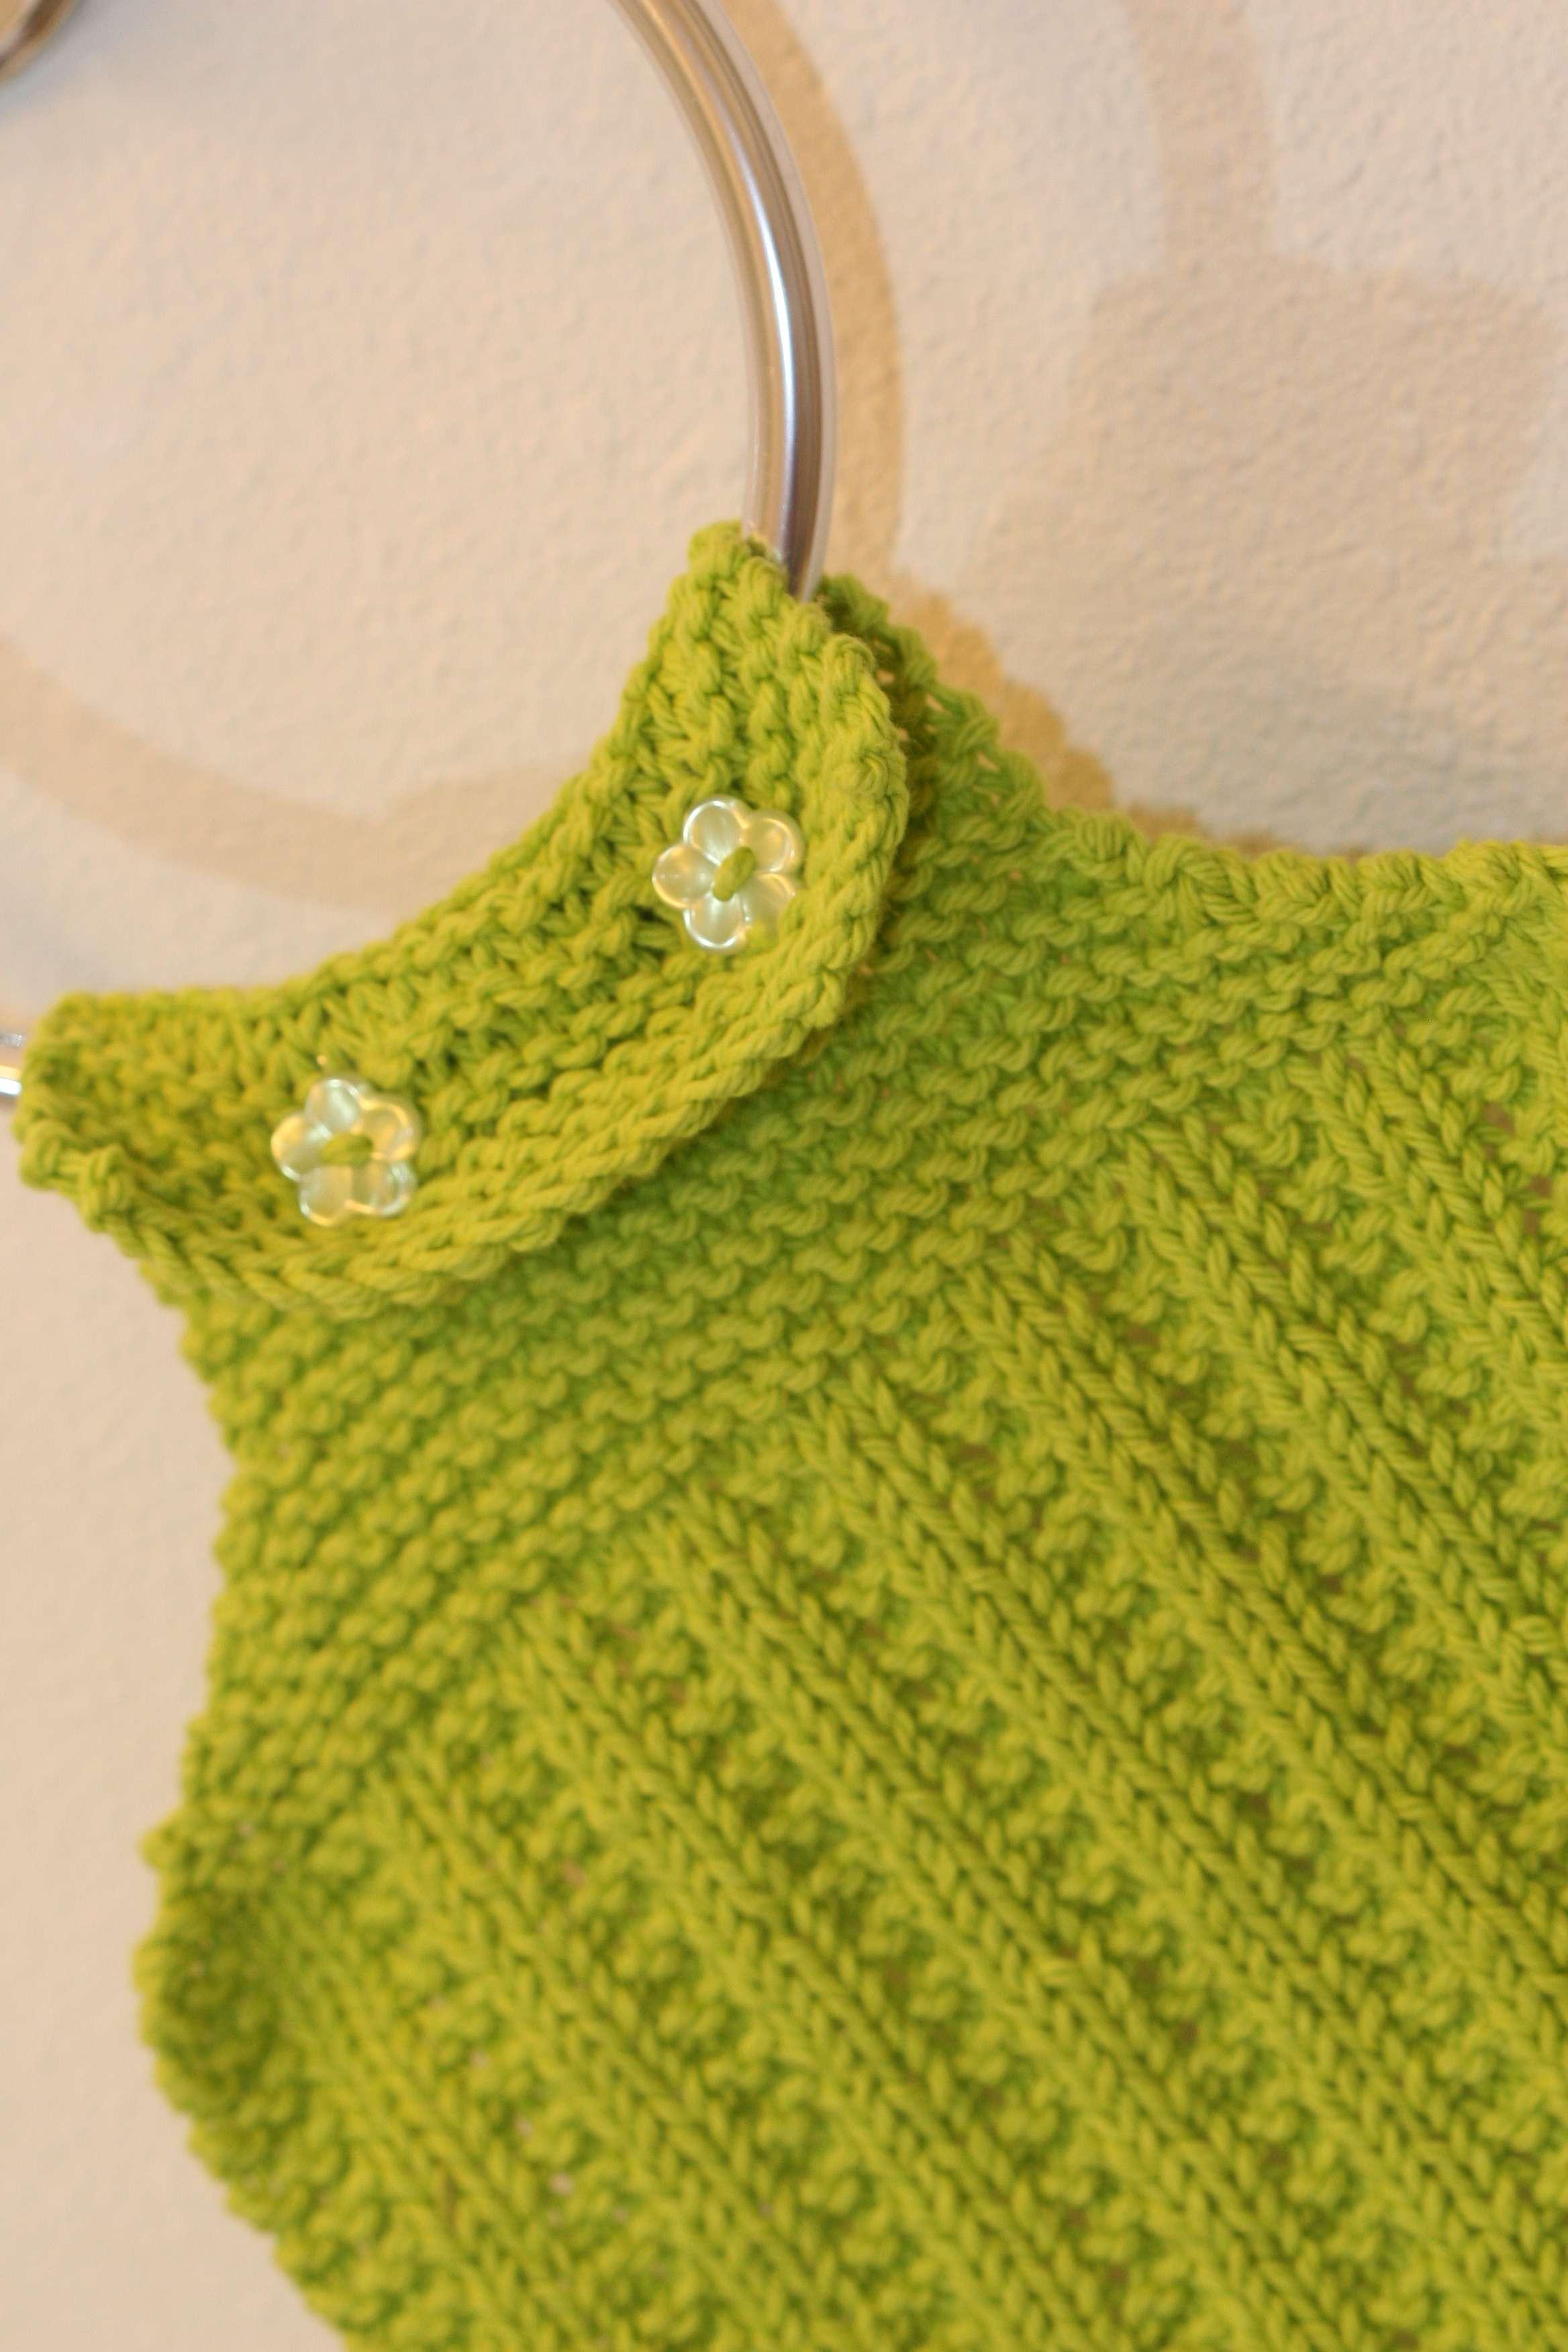 Knitting Patterns For Knitting Board : October   2012   Knitting Board Blog